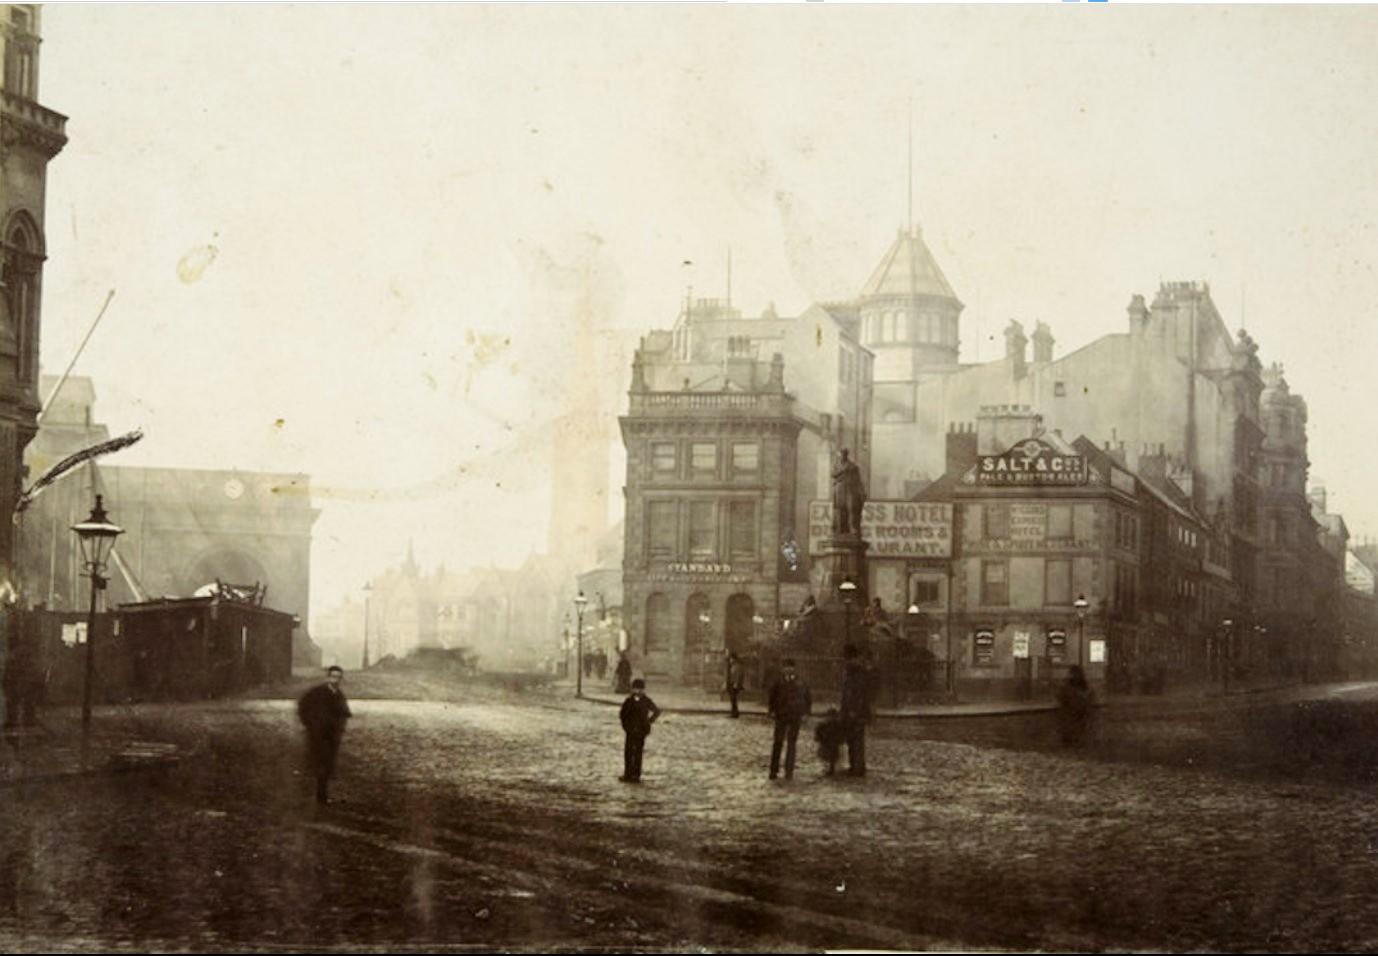 19. Англия. Ньюкасл-апон-Тайн. Вокзальная площадь. Памятник Джорджу Стефенсону. Около 1890 года